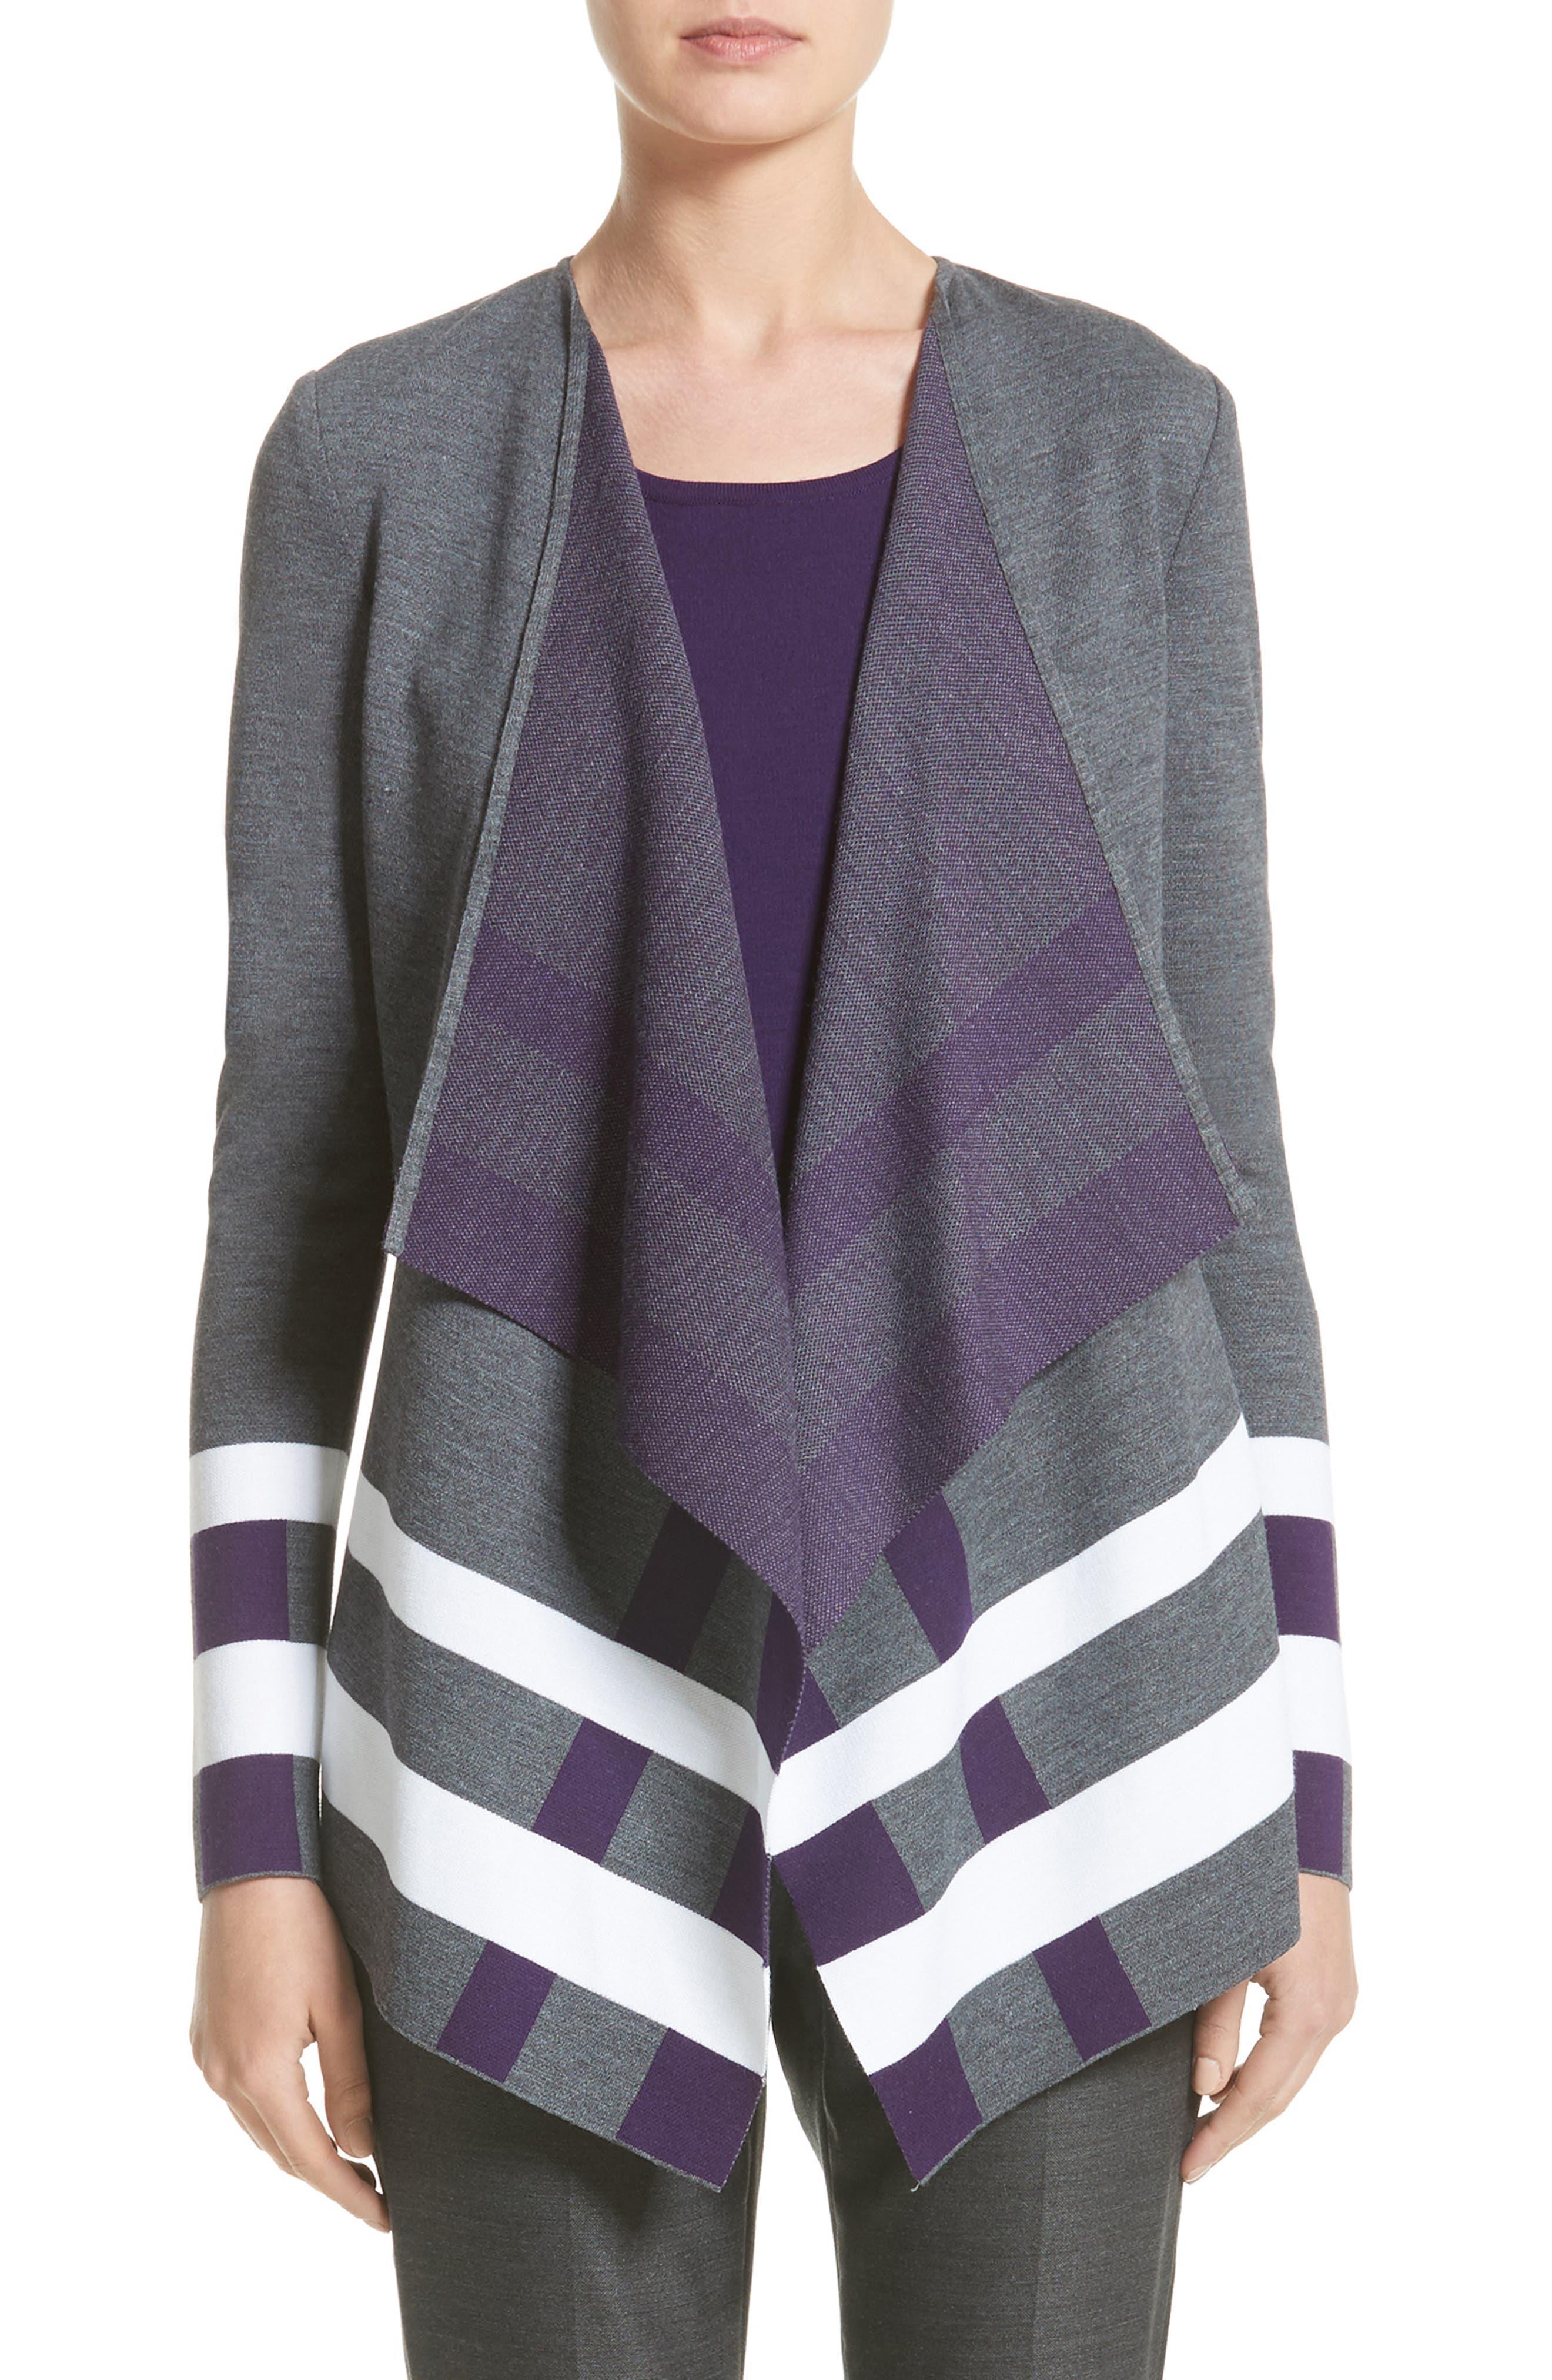 Milano Knit Jacquard Drape Front Jacket,                             Main thumbnail 1, color,                             030